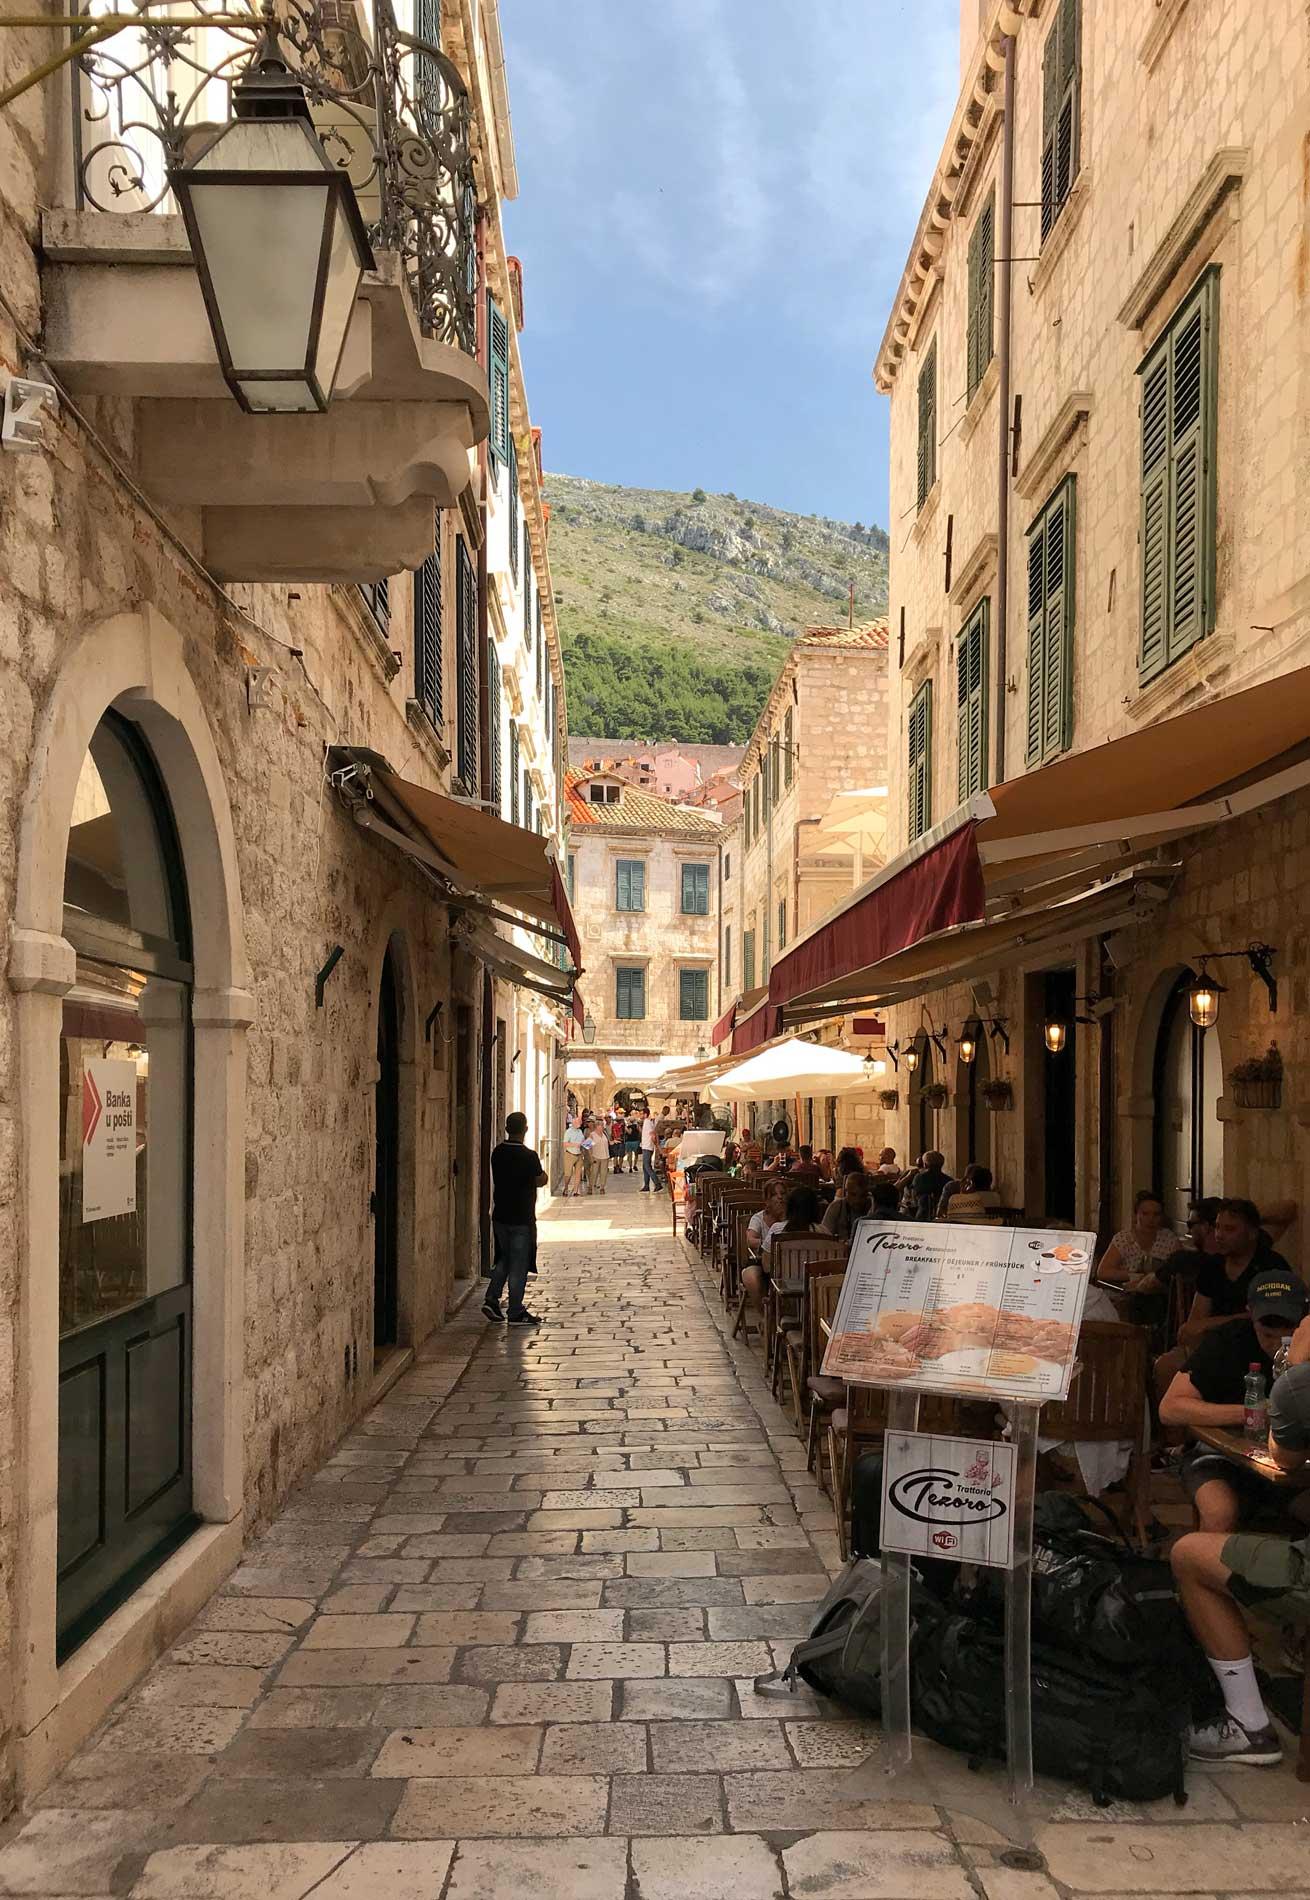 Dubrovnik-Croazia-strada-Citta-Vecchia-turisti-tavolini-Stradun